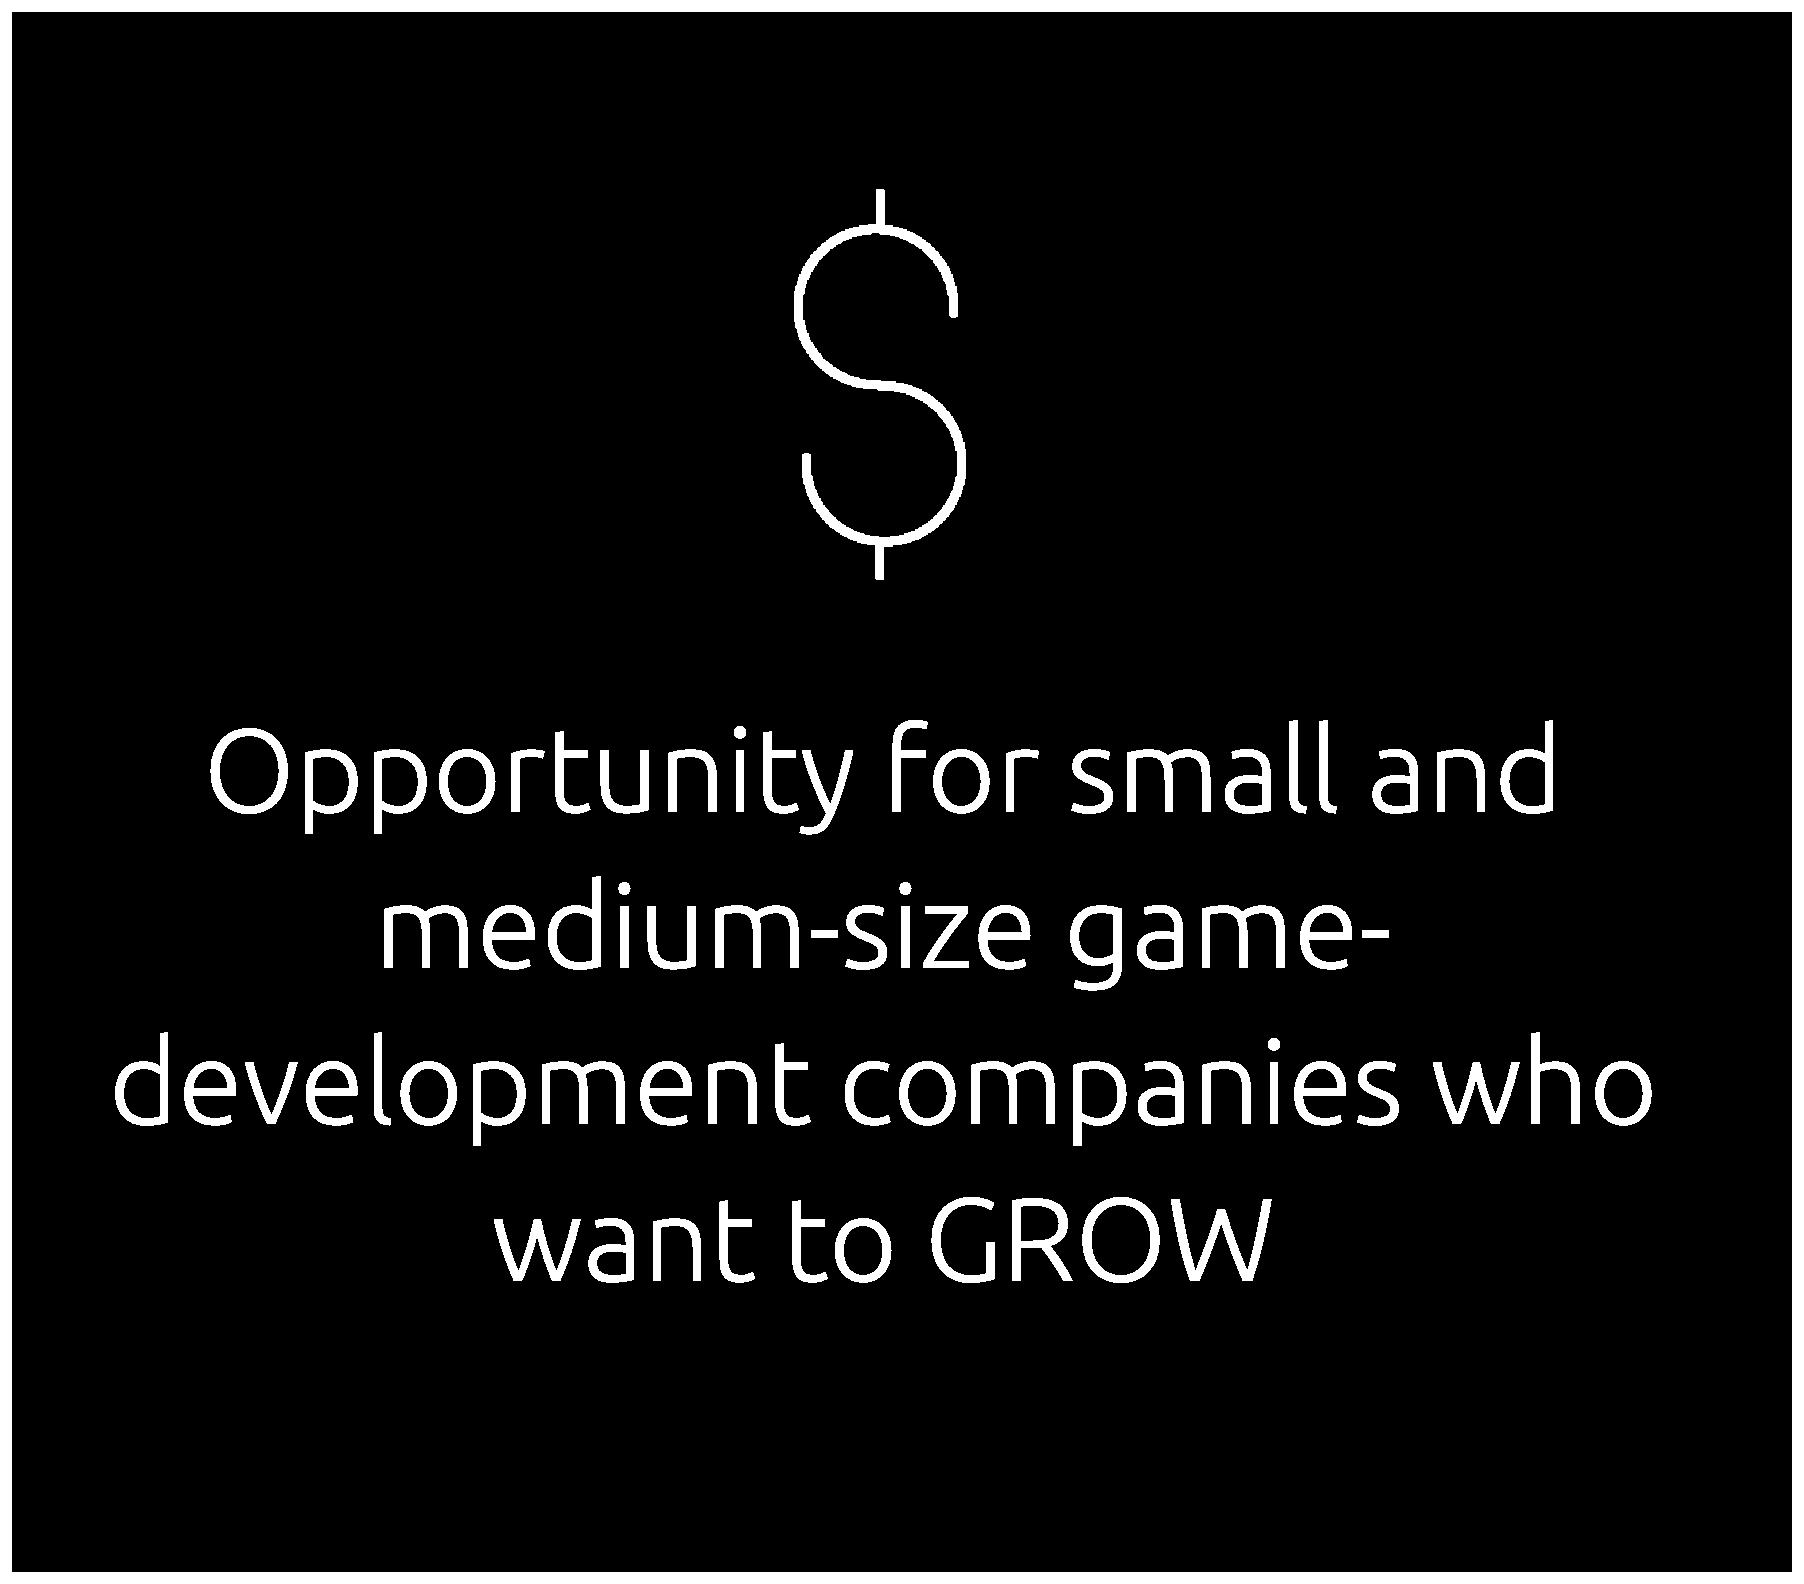 Opportunity for Game-Development Companies Dark